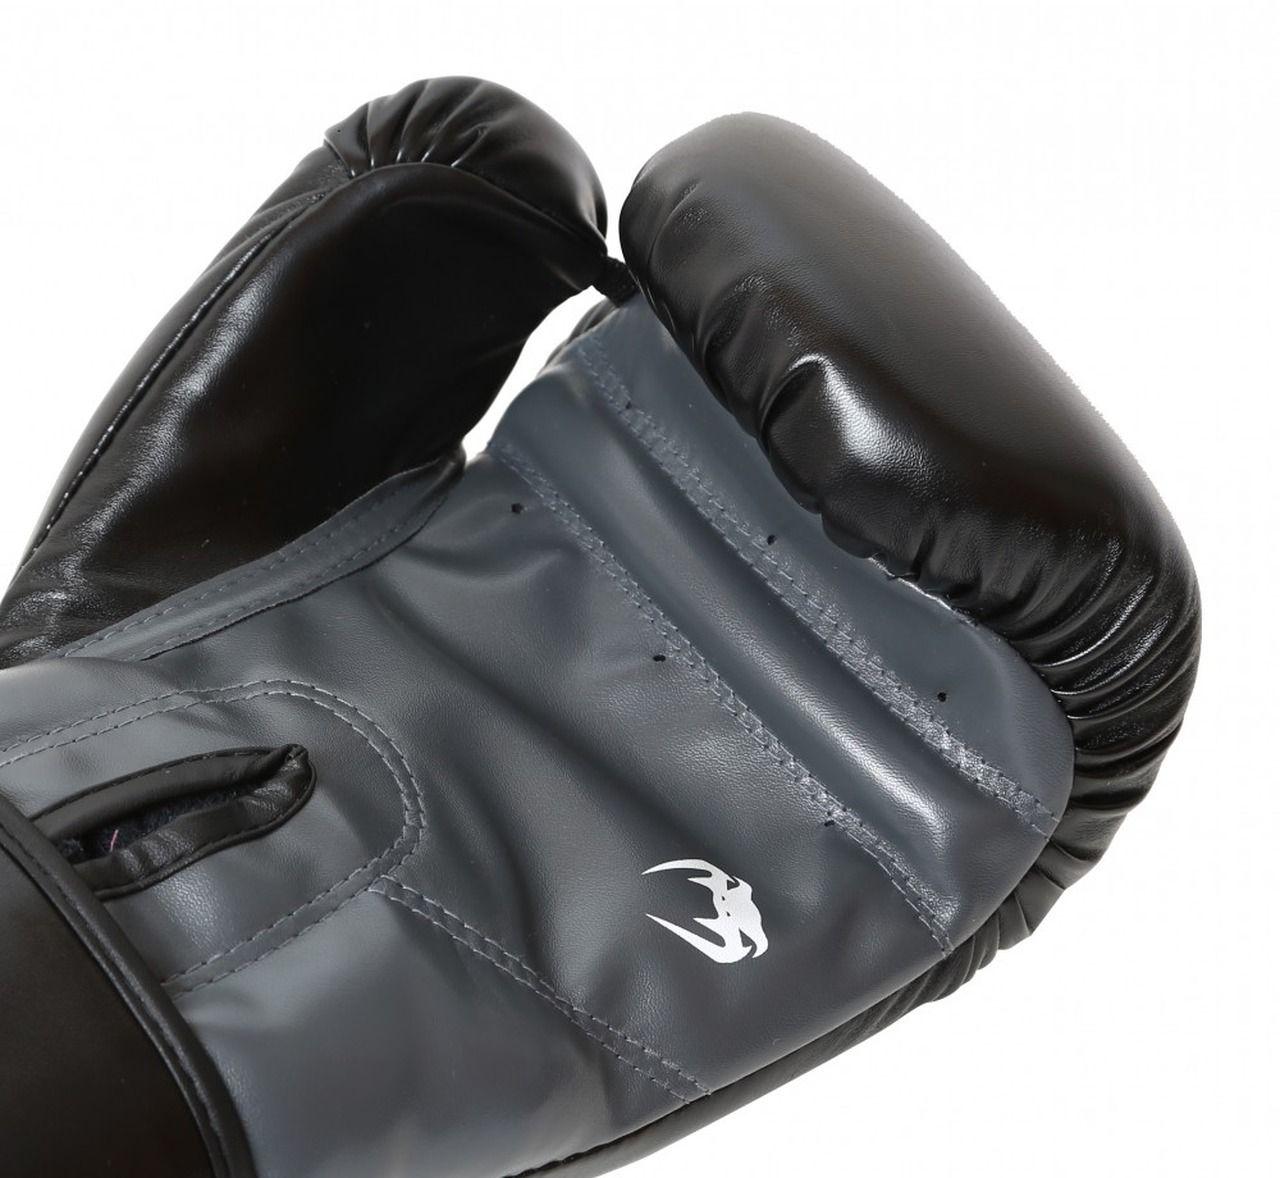 Luva de Boxe / Muay Thai 16oz - Preto - New Contender - Venum  - PRALUTA SHOP